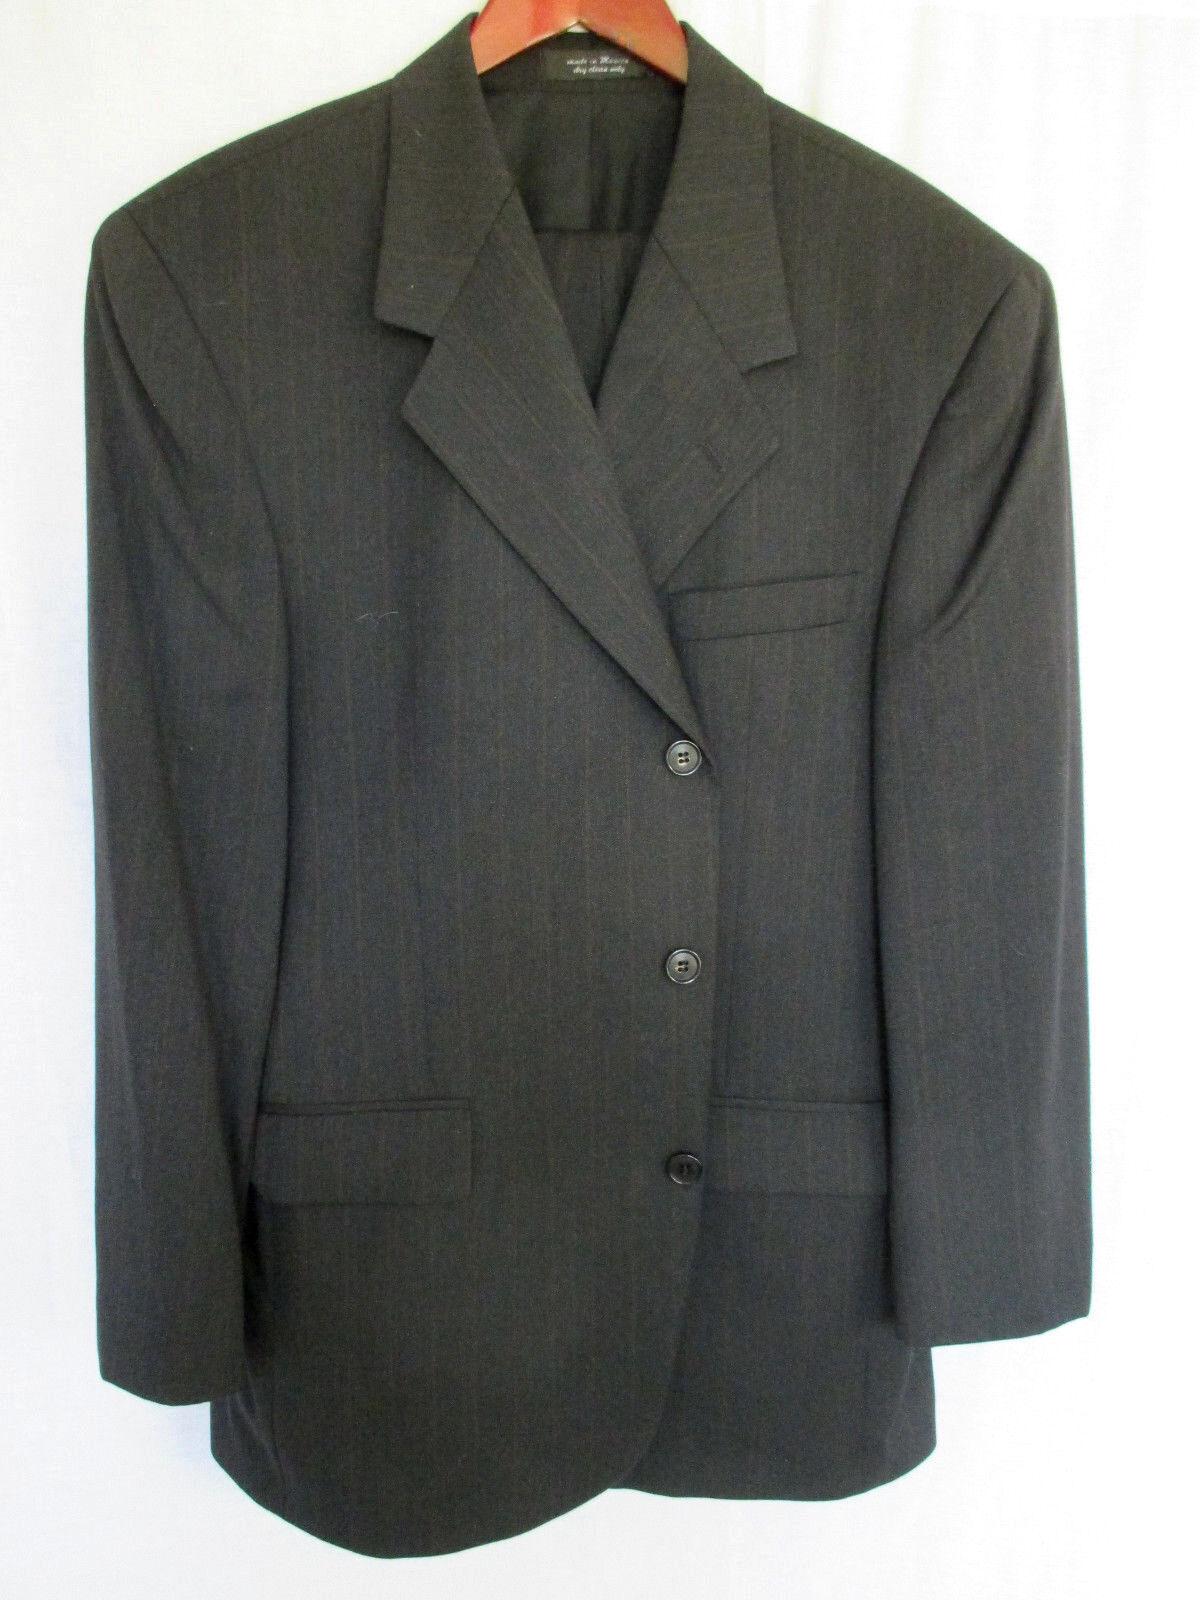 Andrew Fezza 44S 42x23  Herren Suit grau Pinstripe Super 100's Cashmere Wool Blend